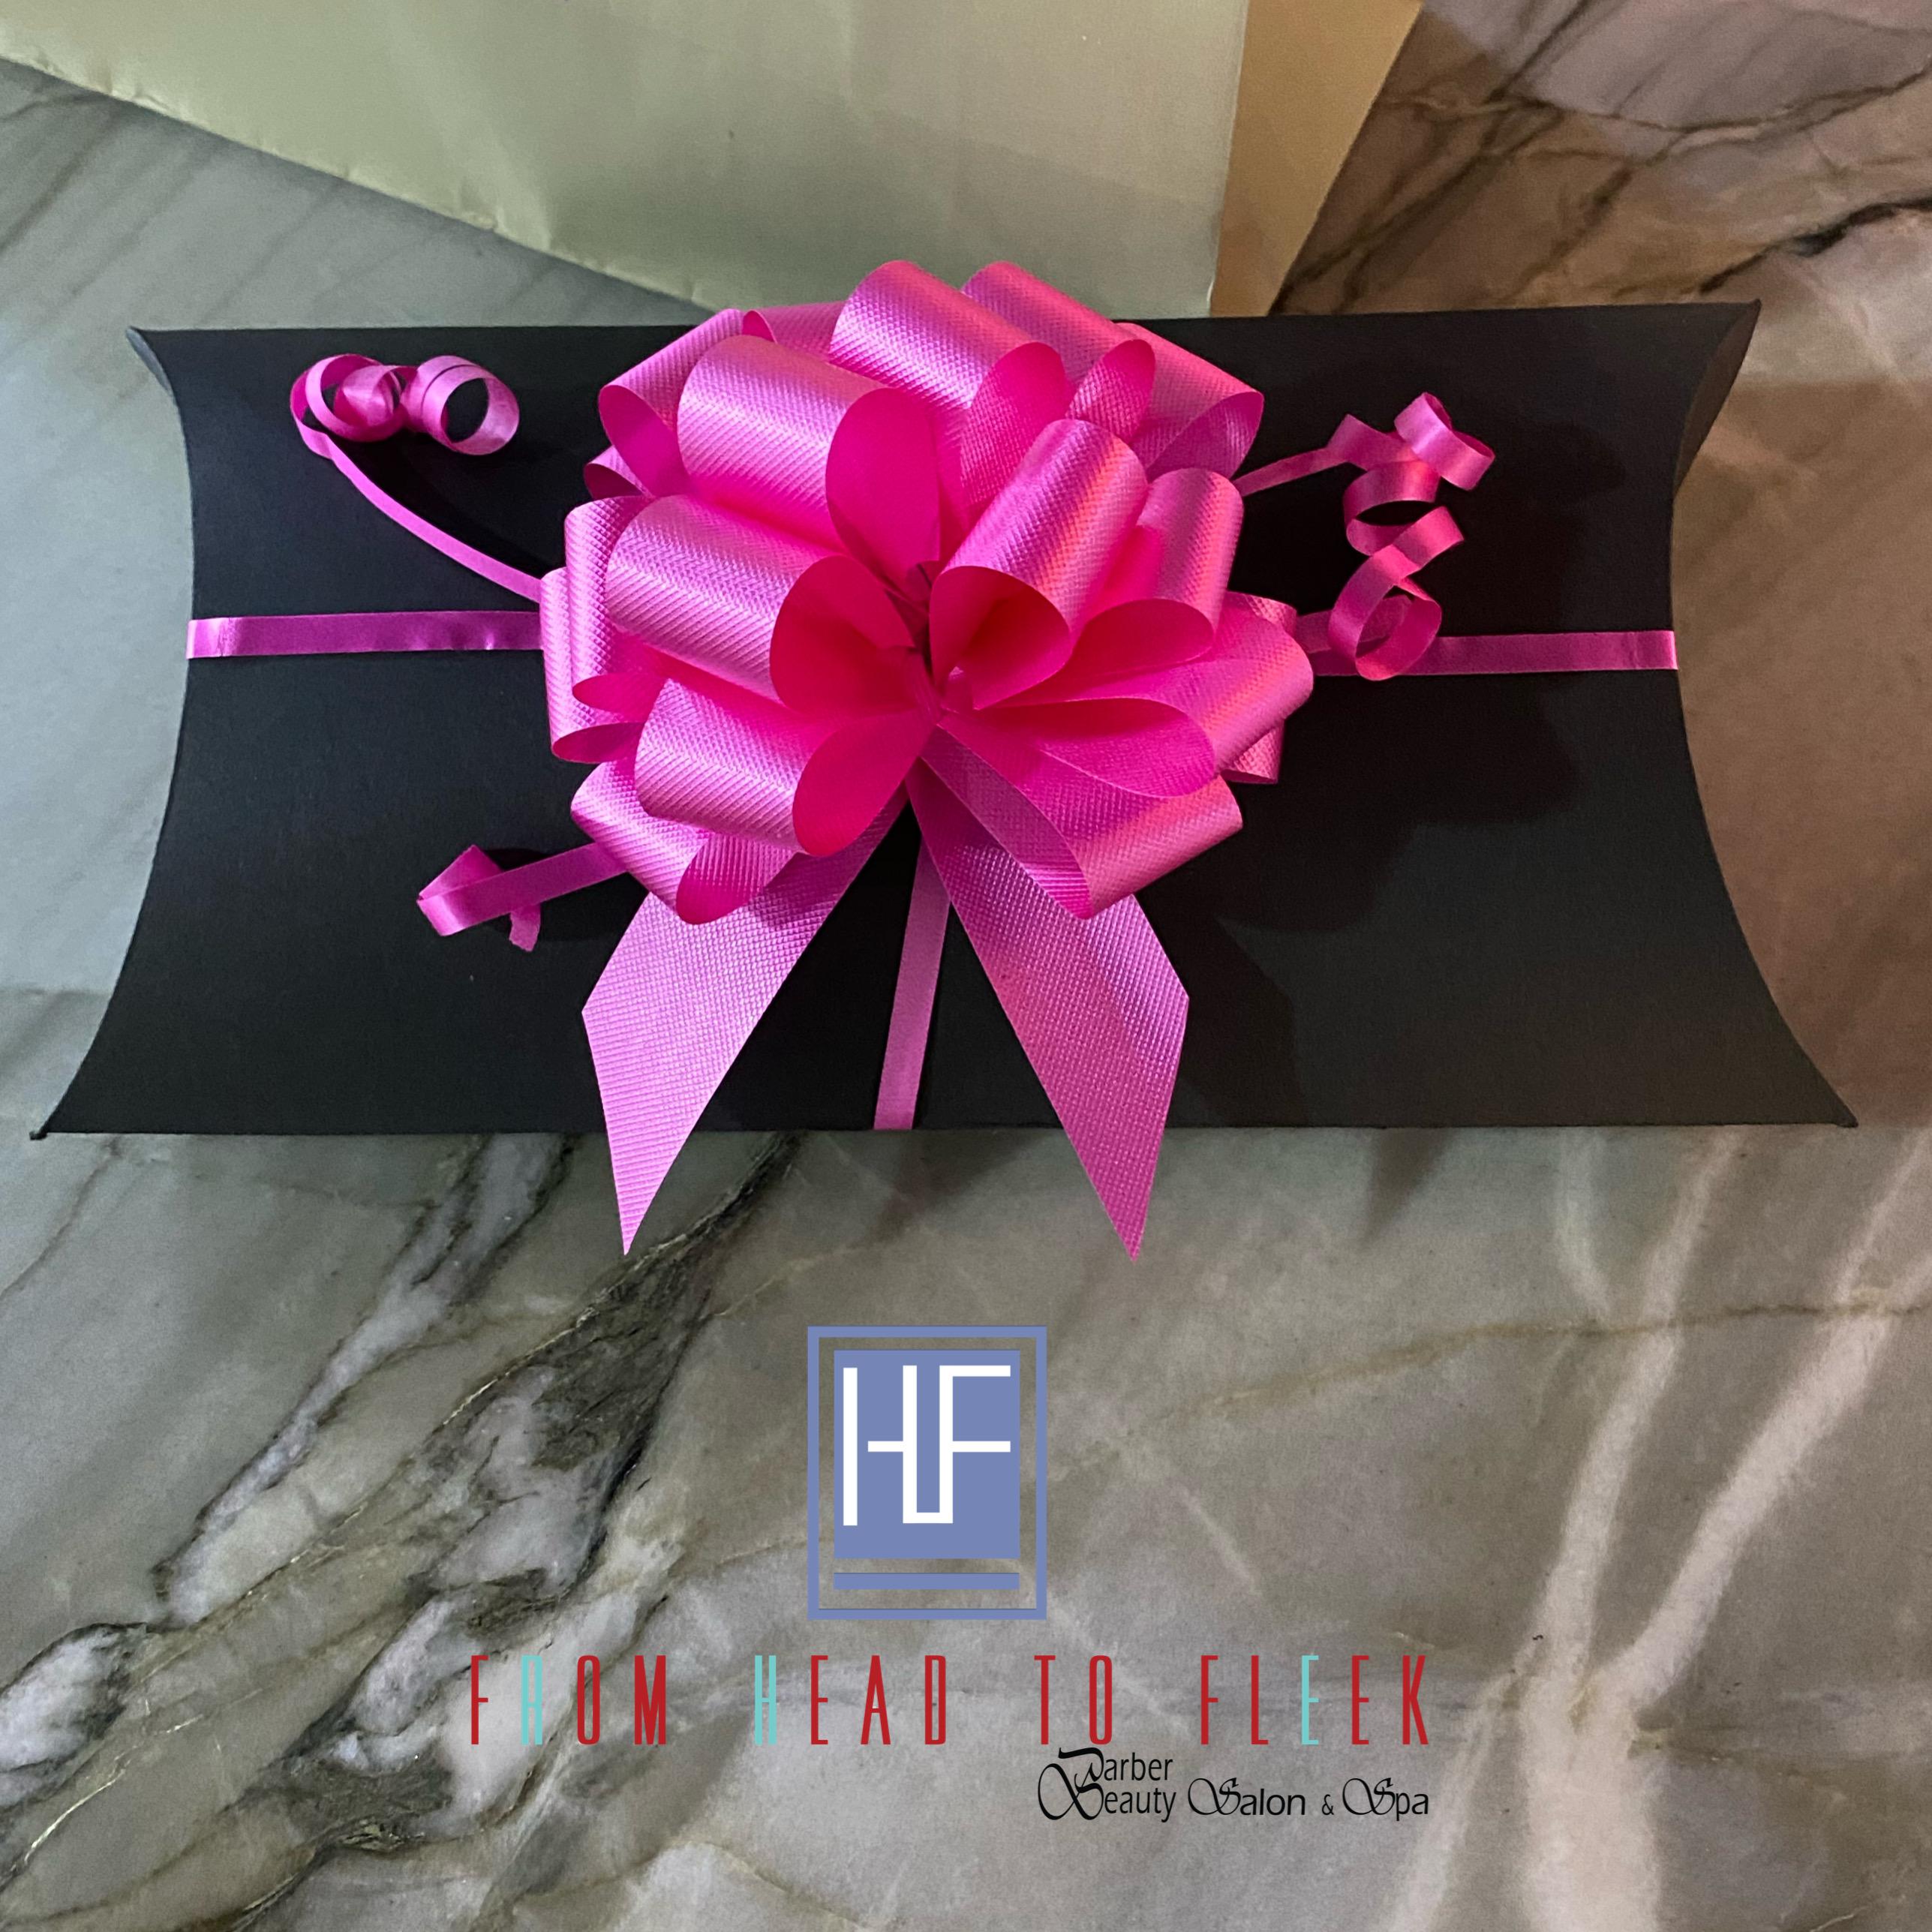 Fleek Gift Certificate, Gift Packages